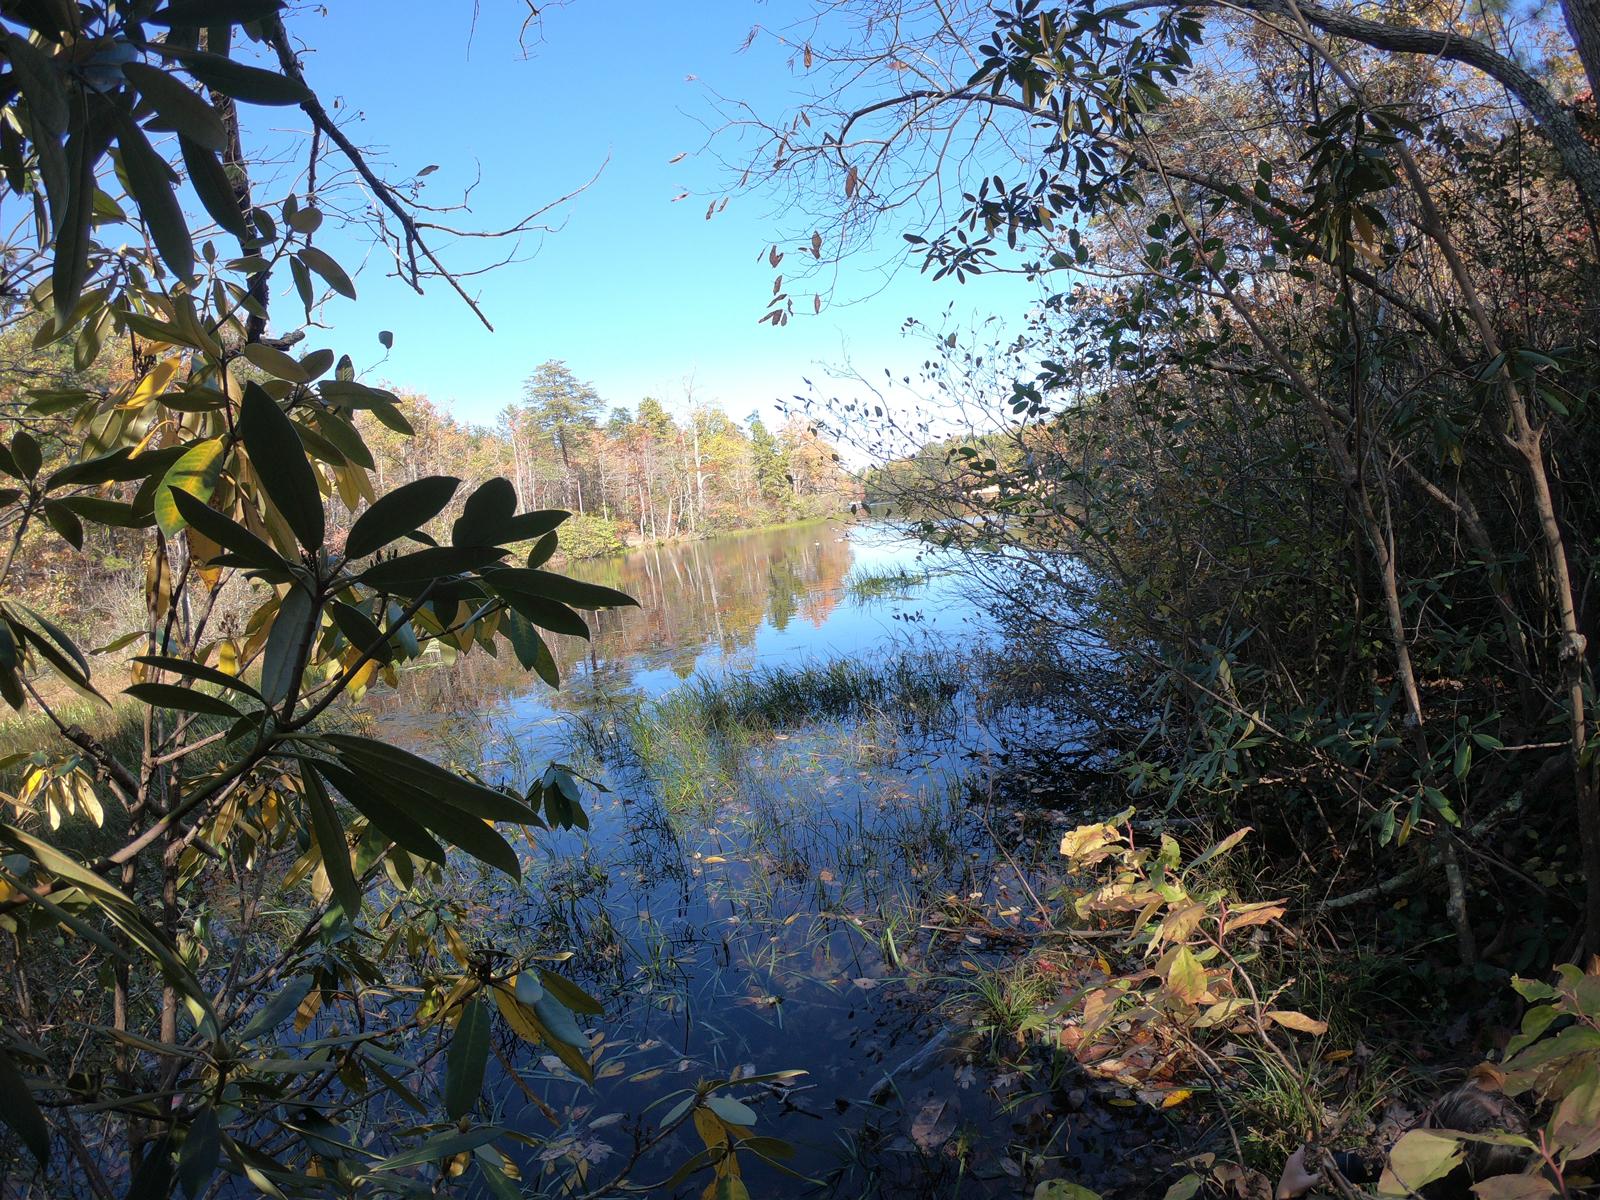 Hiking to the lake in Hanging Rock State Park, North Carolina